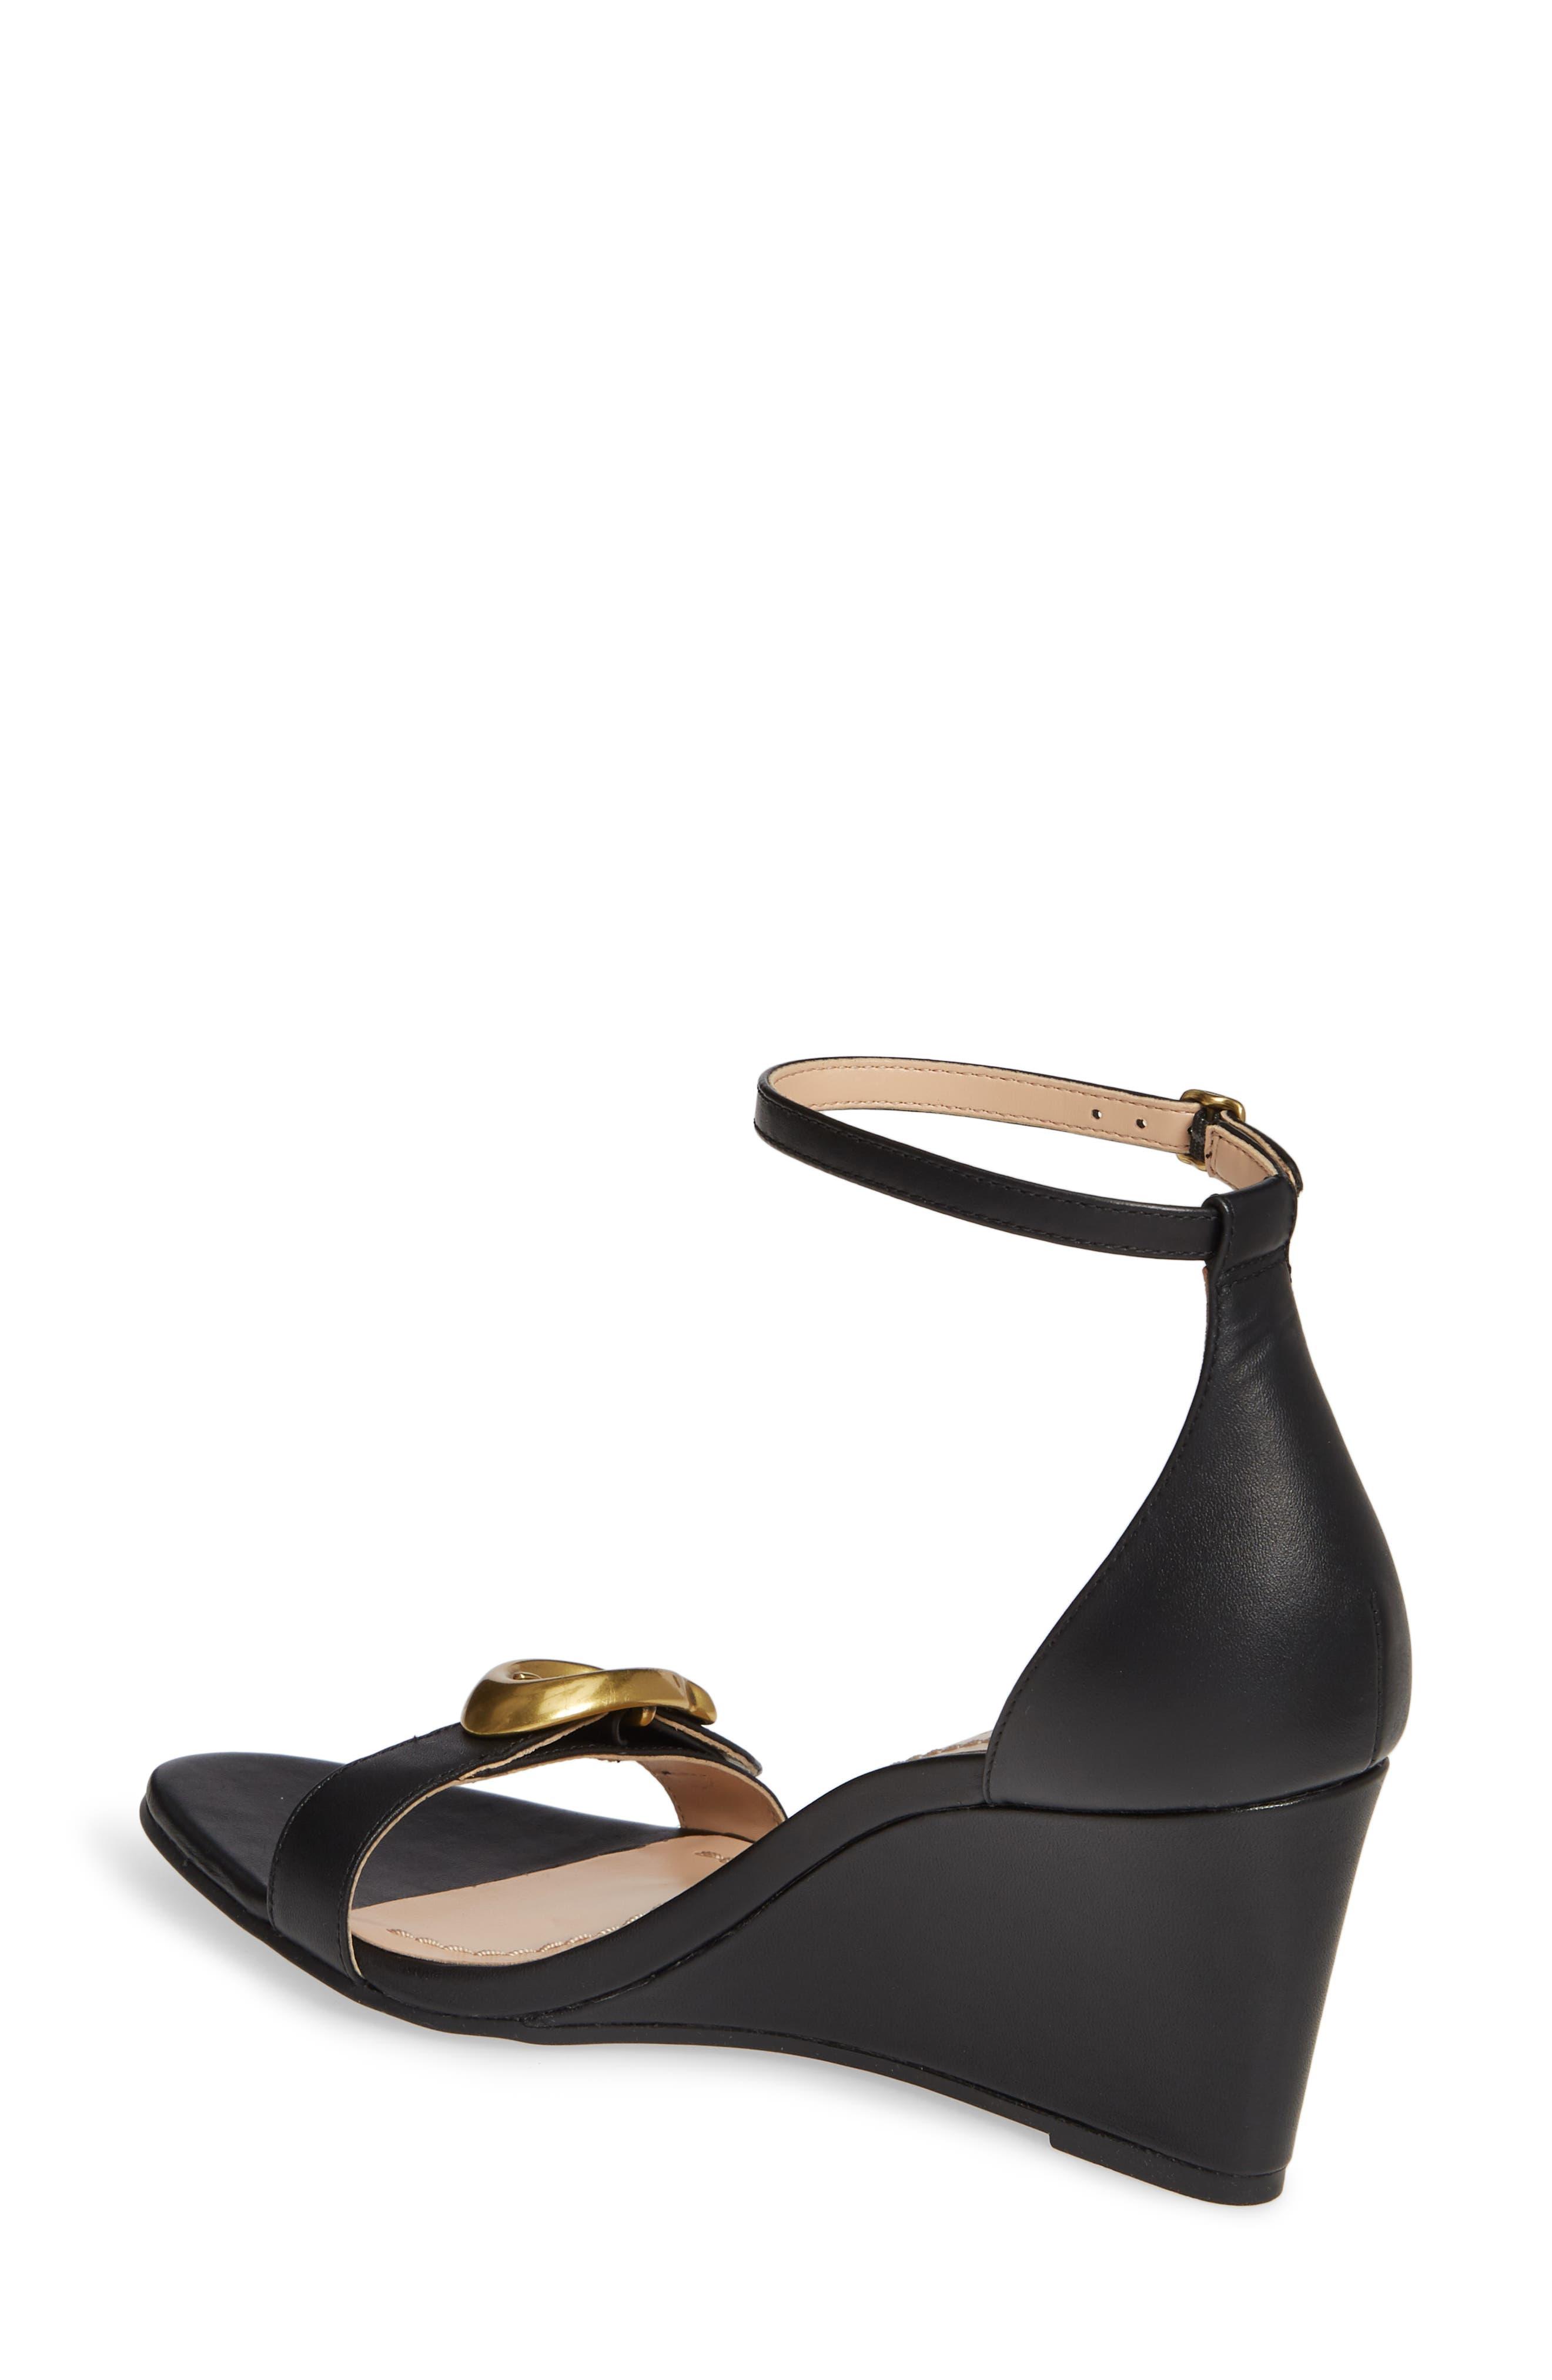 COACH, Odetta Wedge Ankle Strap Sandal, Alternate thumbnail 2, color, BLACK LEATHER